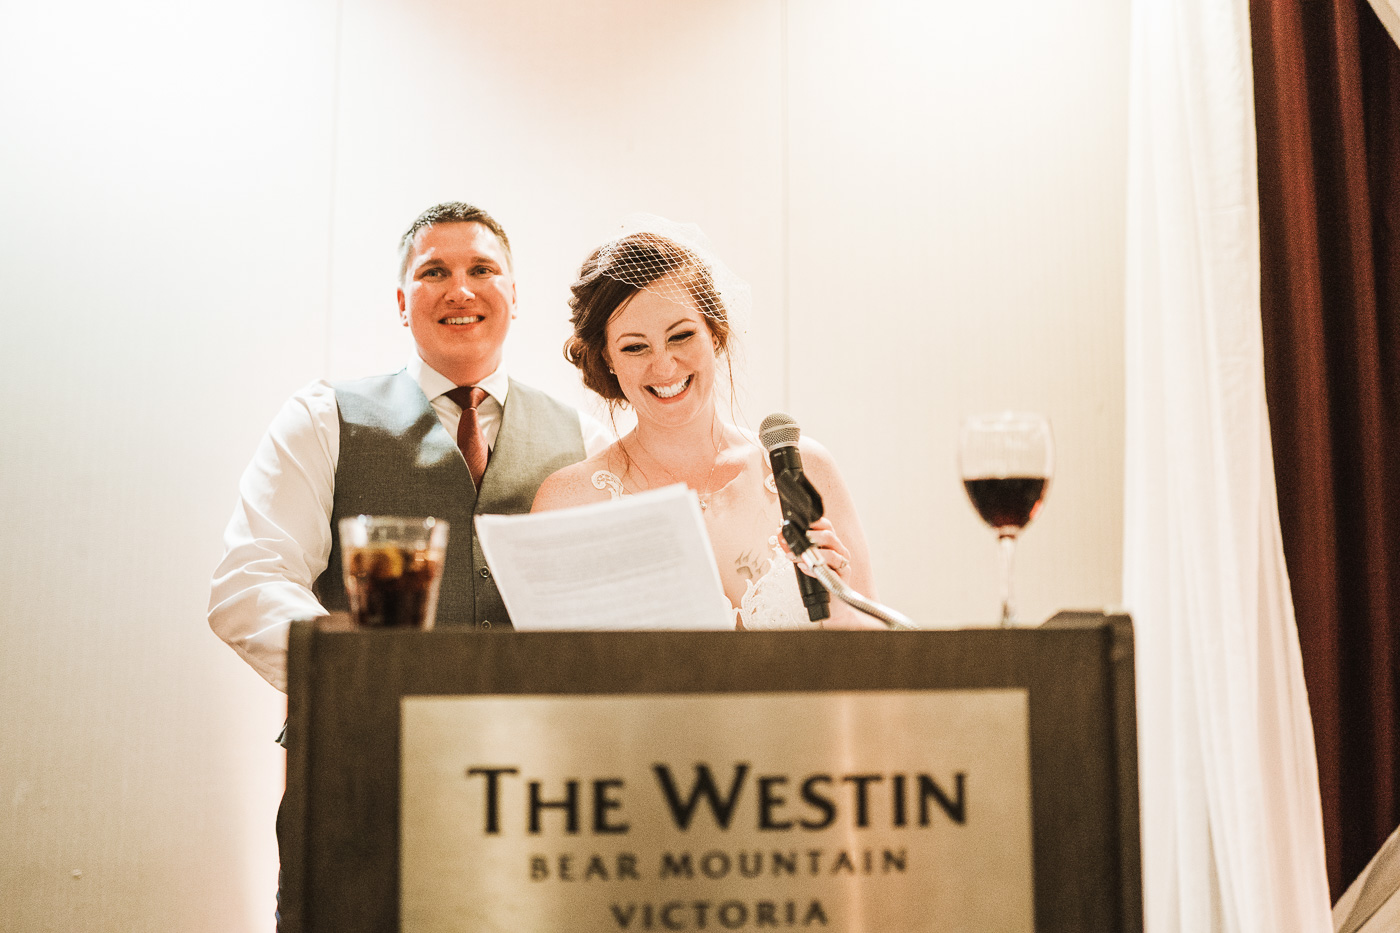 Jon-Mark Photography Victoria BC Wedding Photography - Hatley Castle Wedding Photography - Bear Mountain Wedding Photography